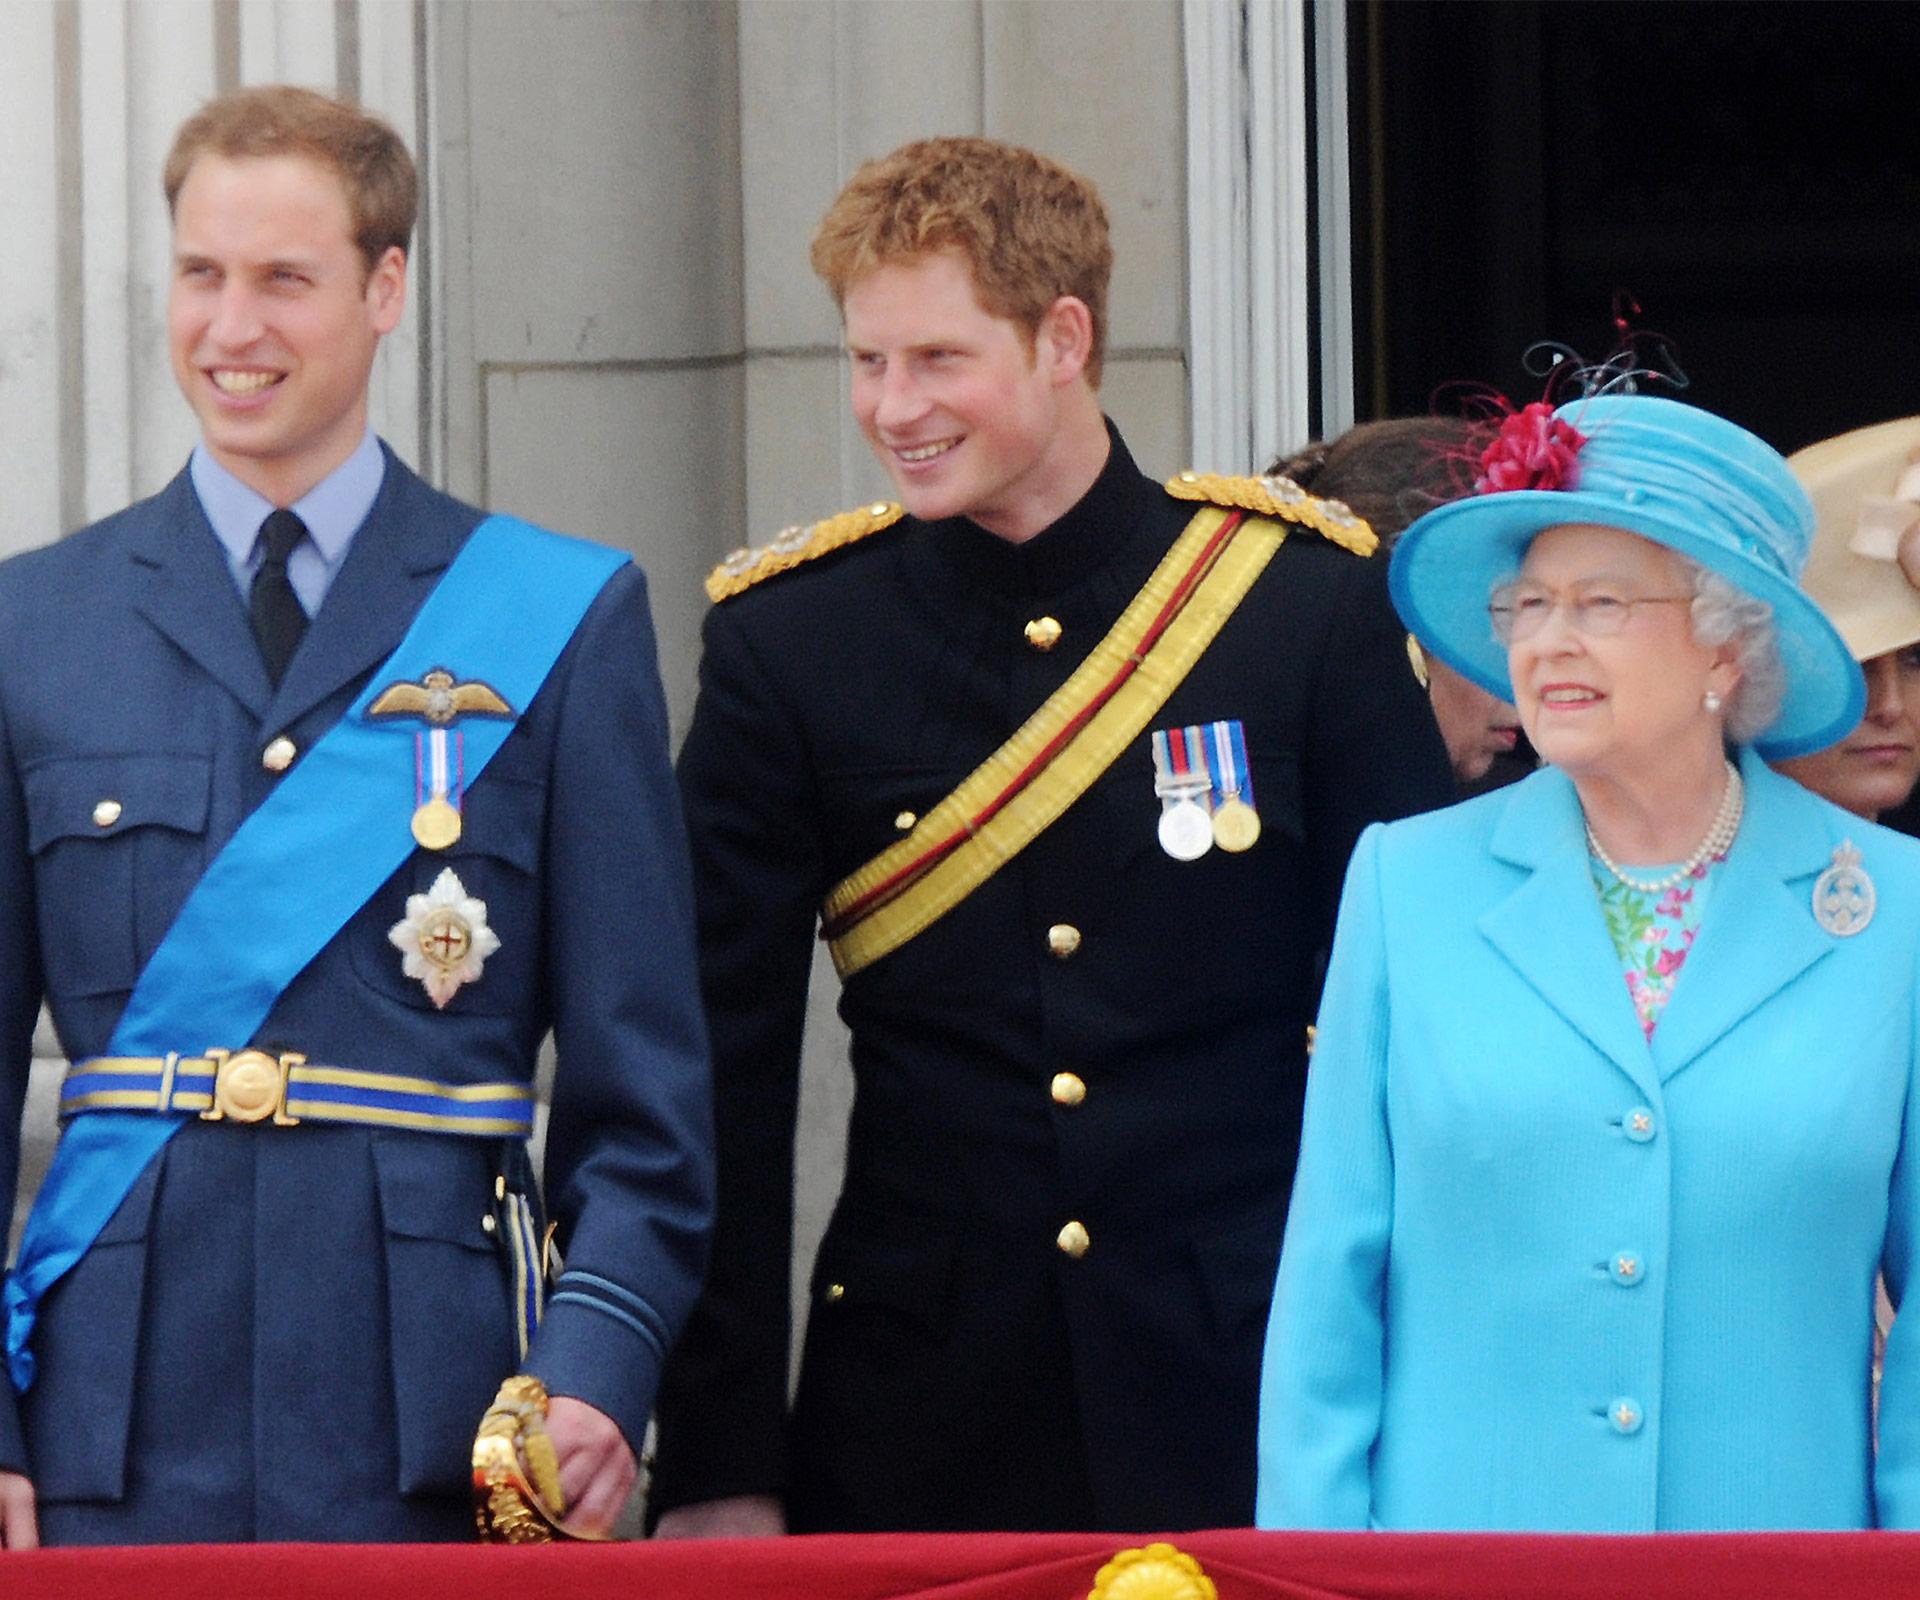 Duke of Edinburgh 'won't completely disappear', Prince Edward says